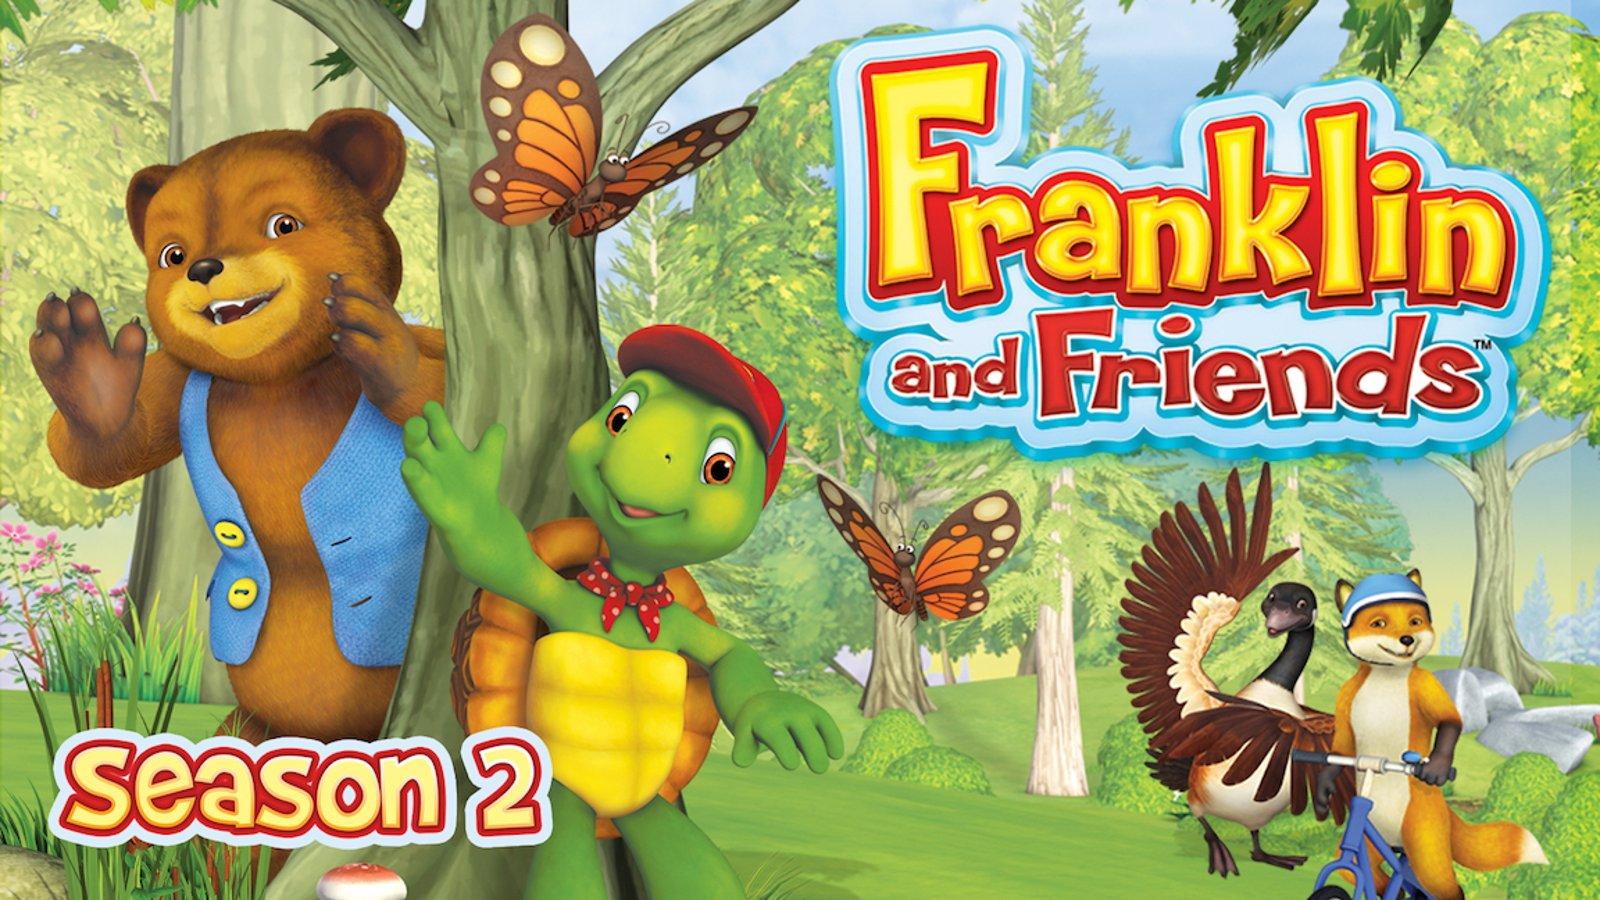 Franklin and Friends Season 2